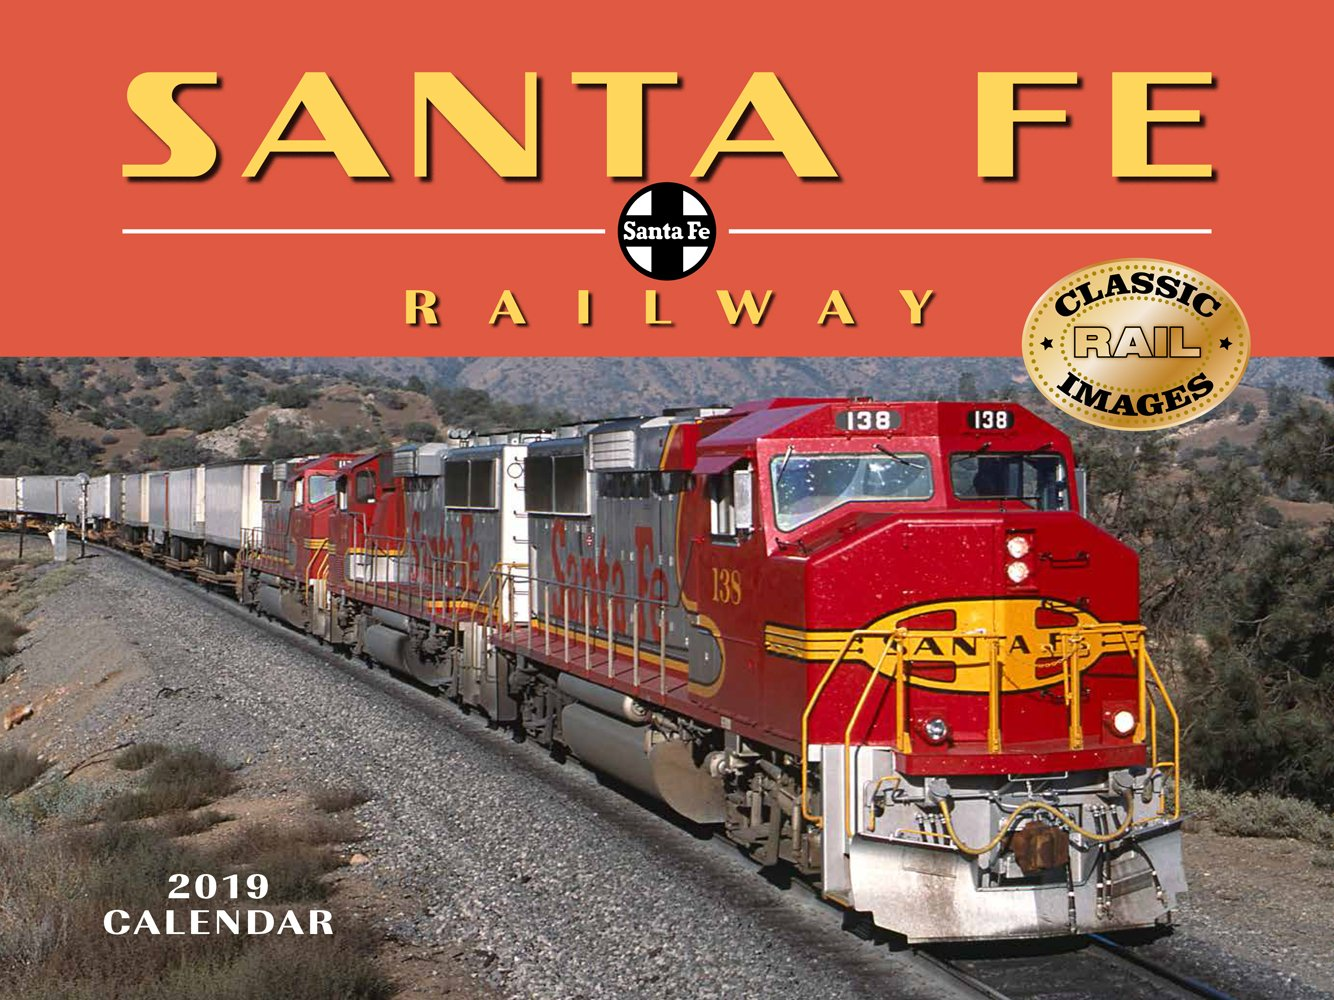 Santa Fe Calendar 2019 Santa Fe Railway 2019 Calendar Classic Rail Images: Tide mark